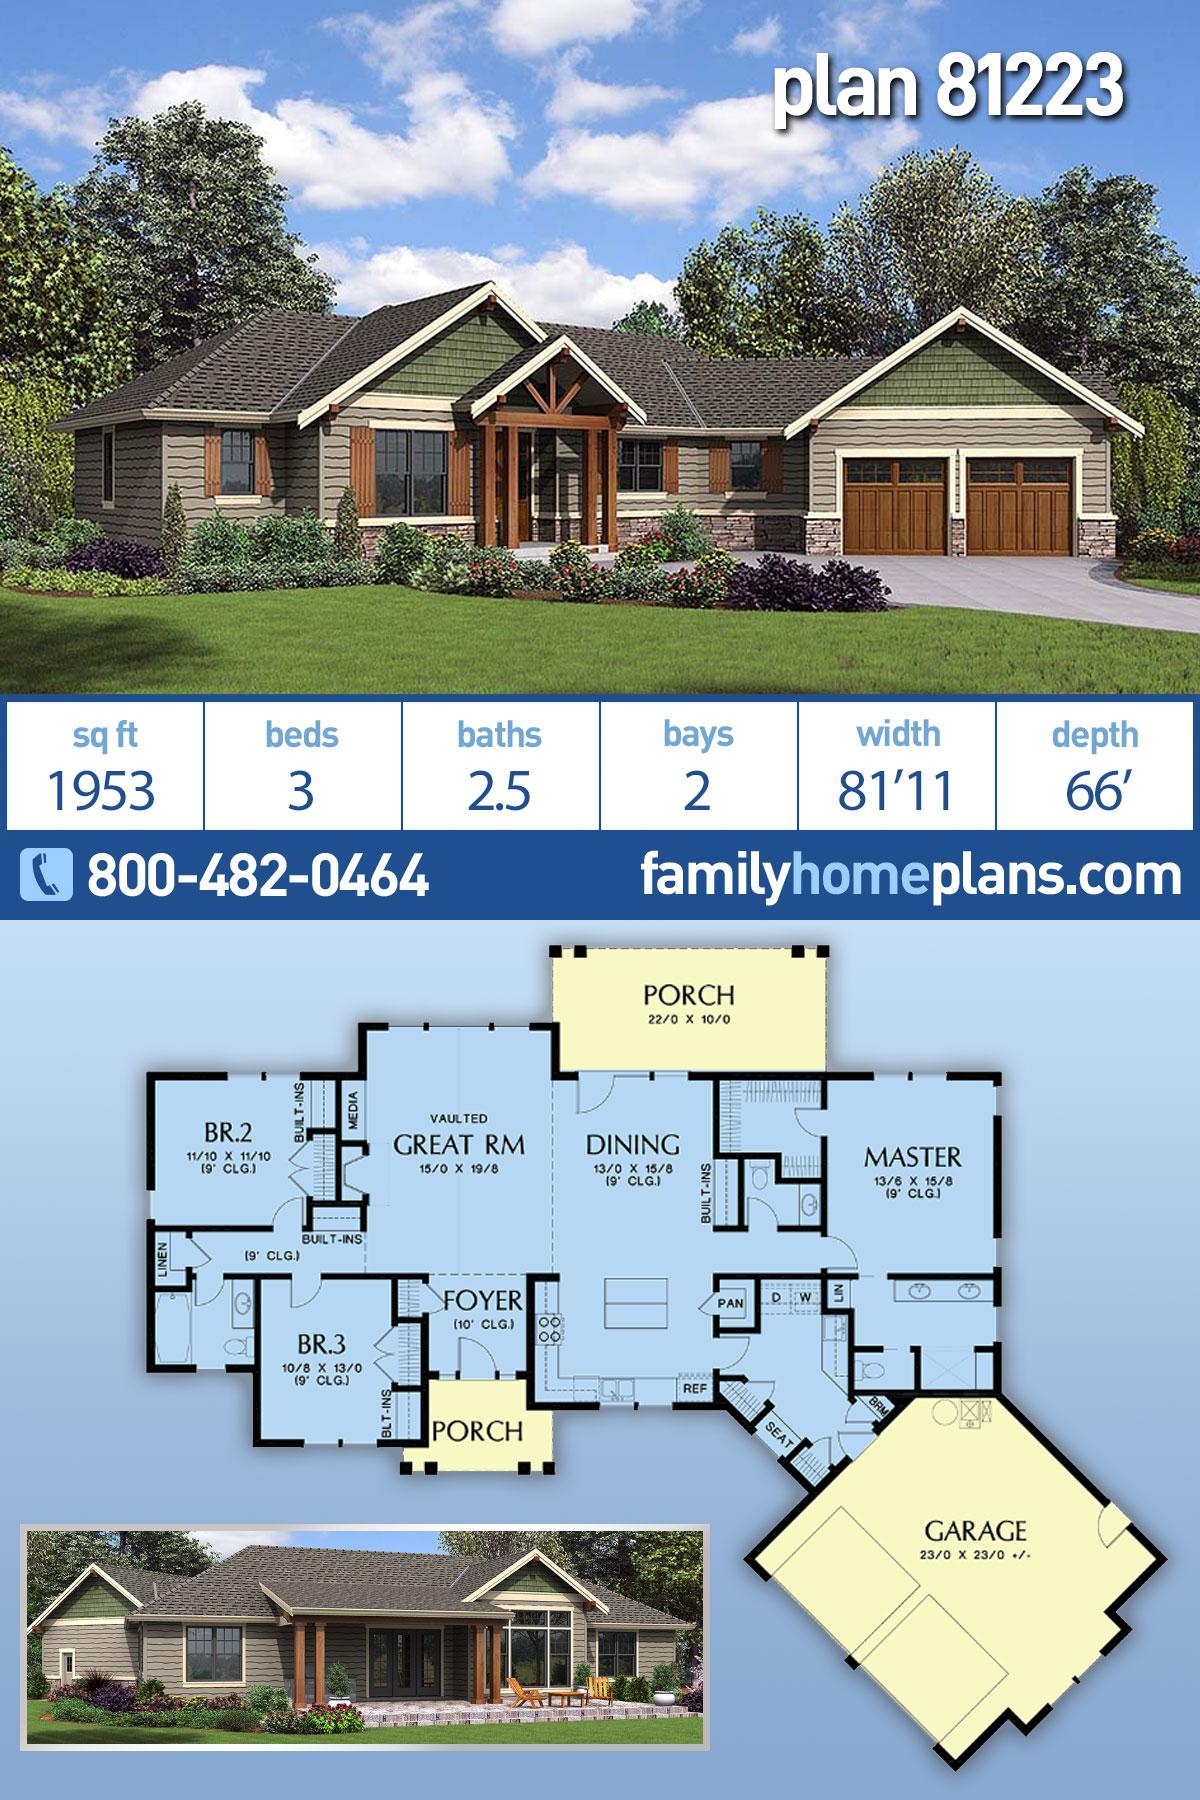 Craftsman, Ranch House Plan 81223 with 3 Beds, 3 Baths, 2 Car Garage